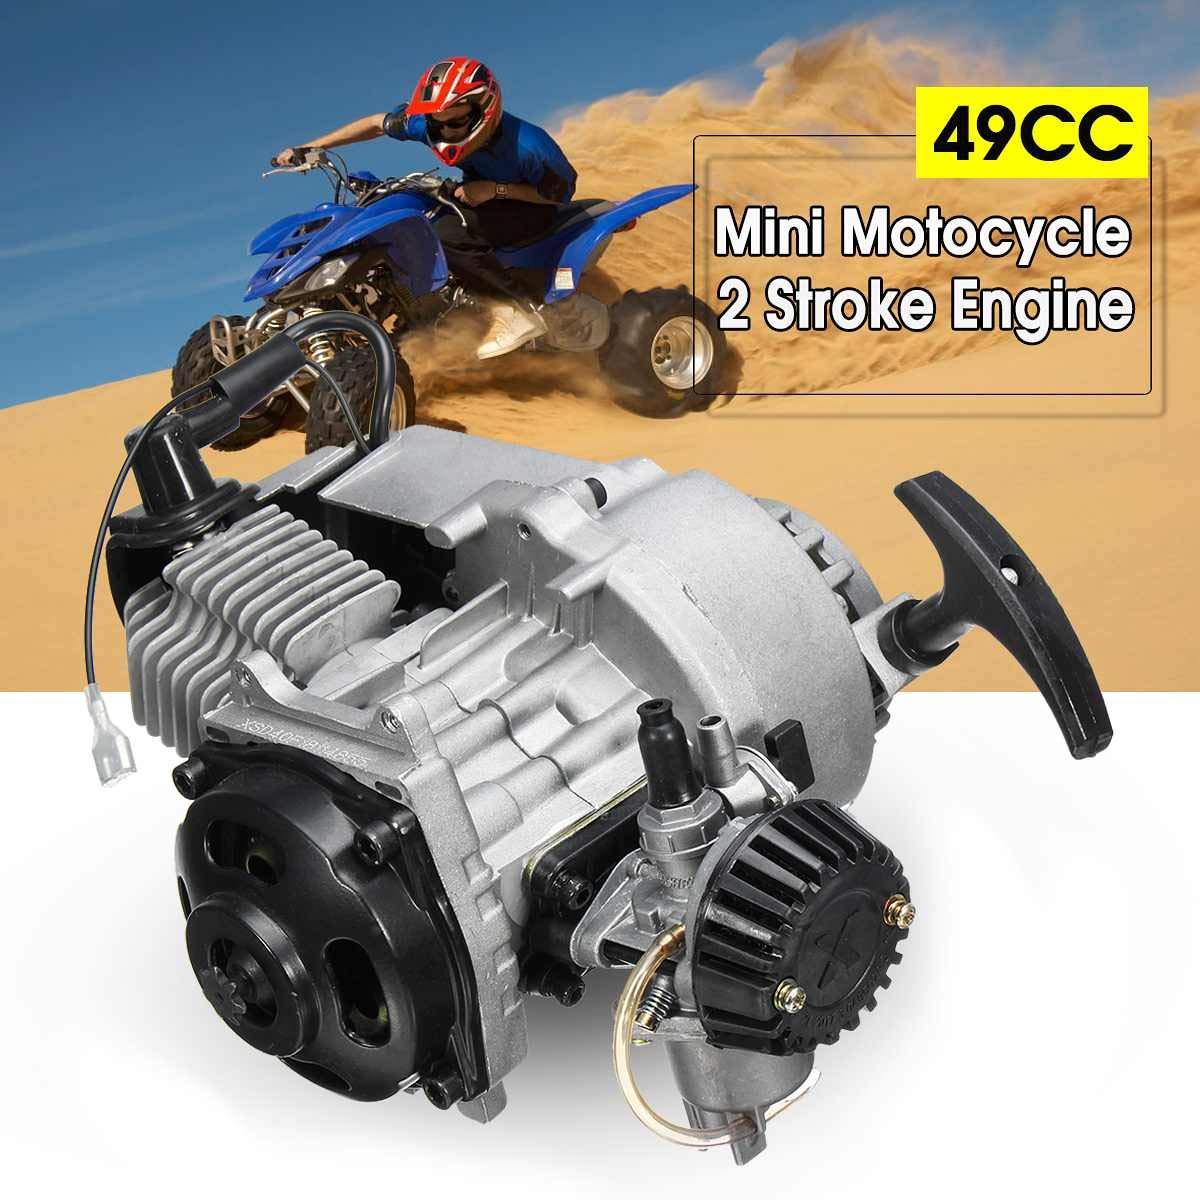 49cc 2-Stroke CDI Hand Pull Start Engine Motor For Pocket Bike Mini Dirt Bike ATV Scooter by Unkows (Image #1)